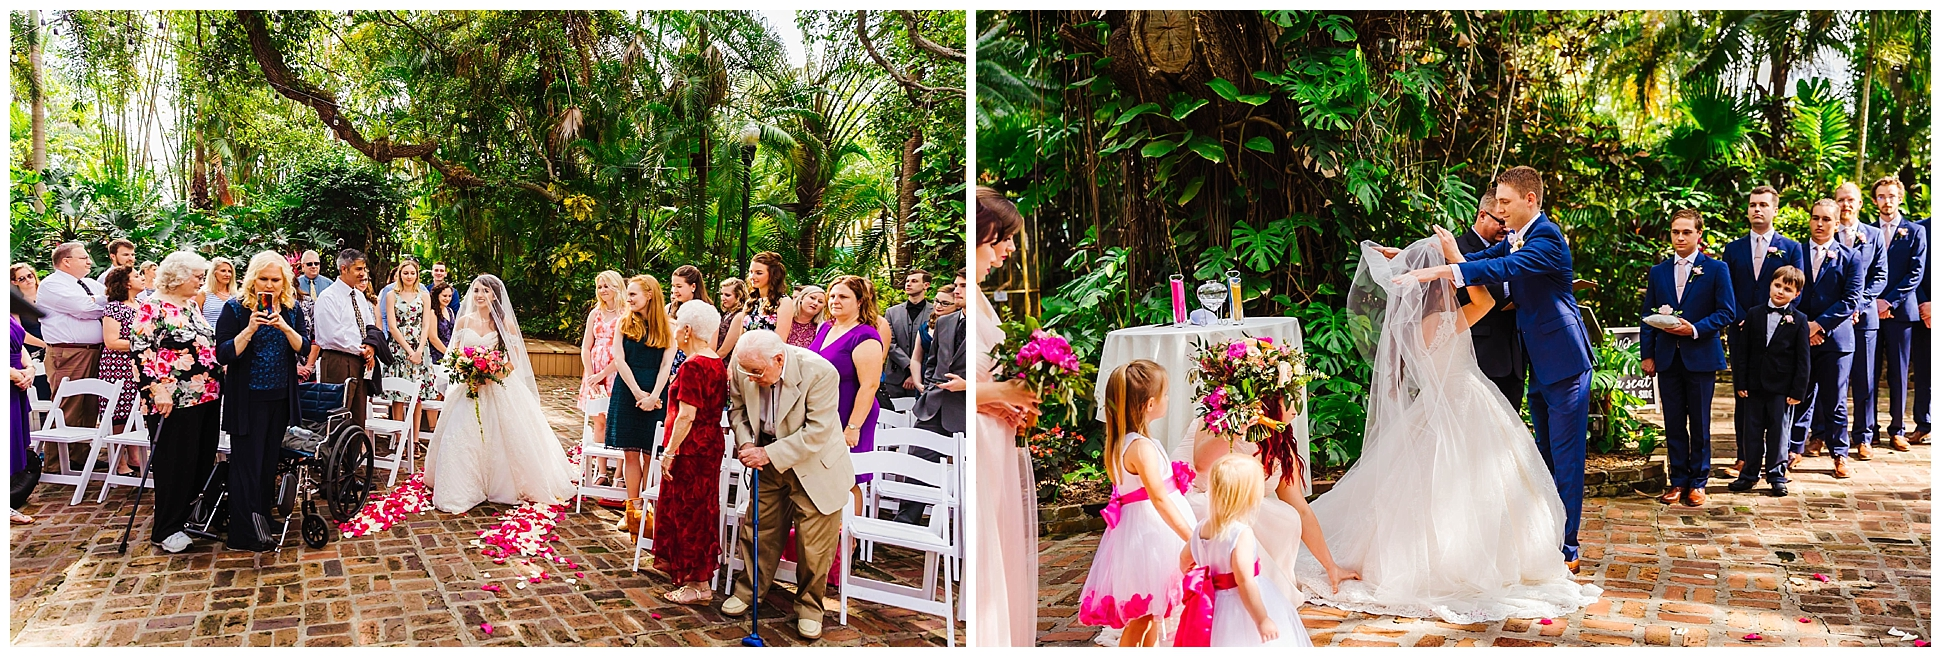 st-pete-wedding-photographer-sunken-gardens-crystal-ballroom-princess-dancer_0149.jpg